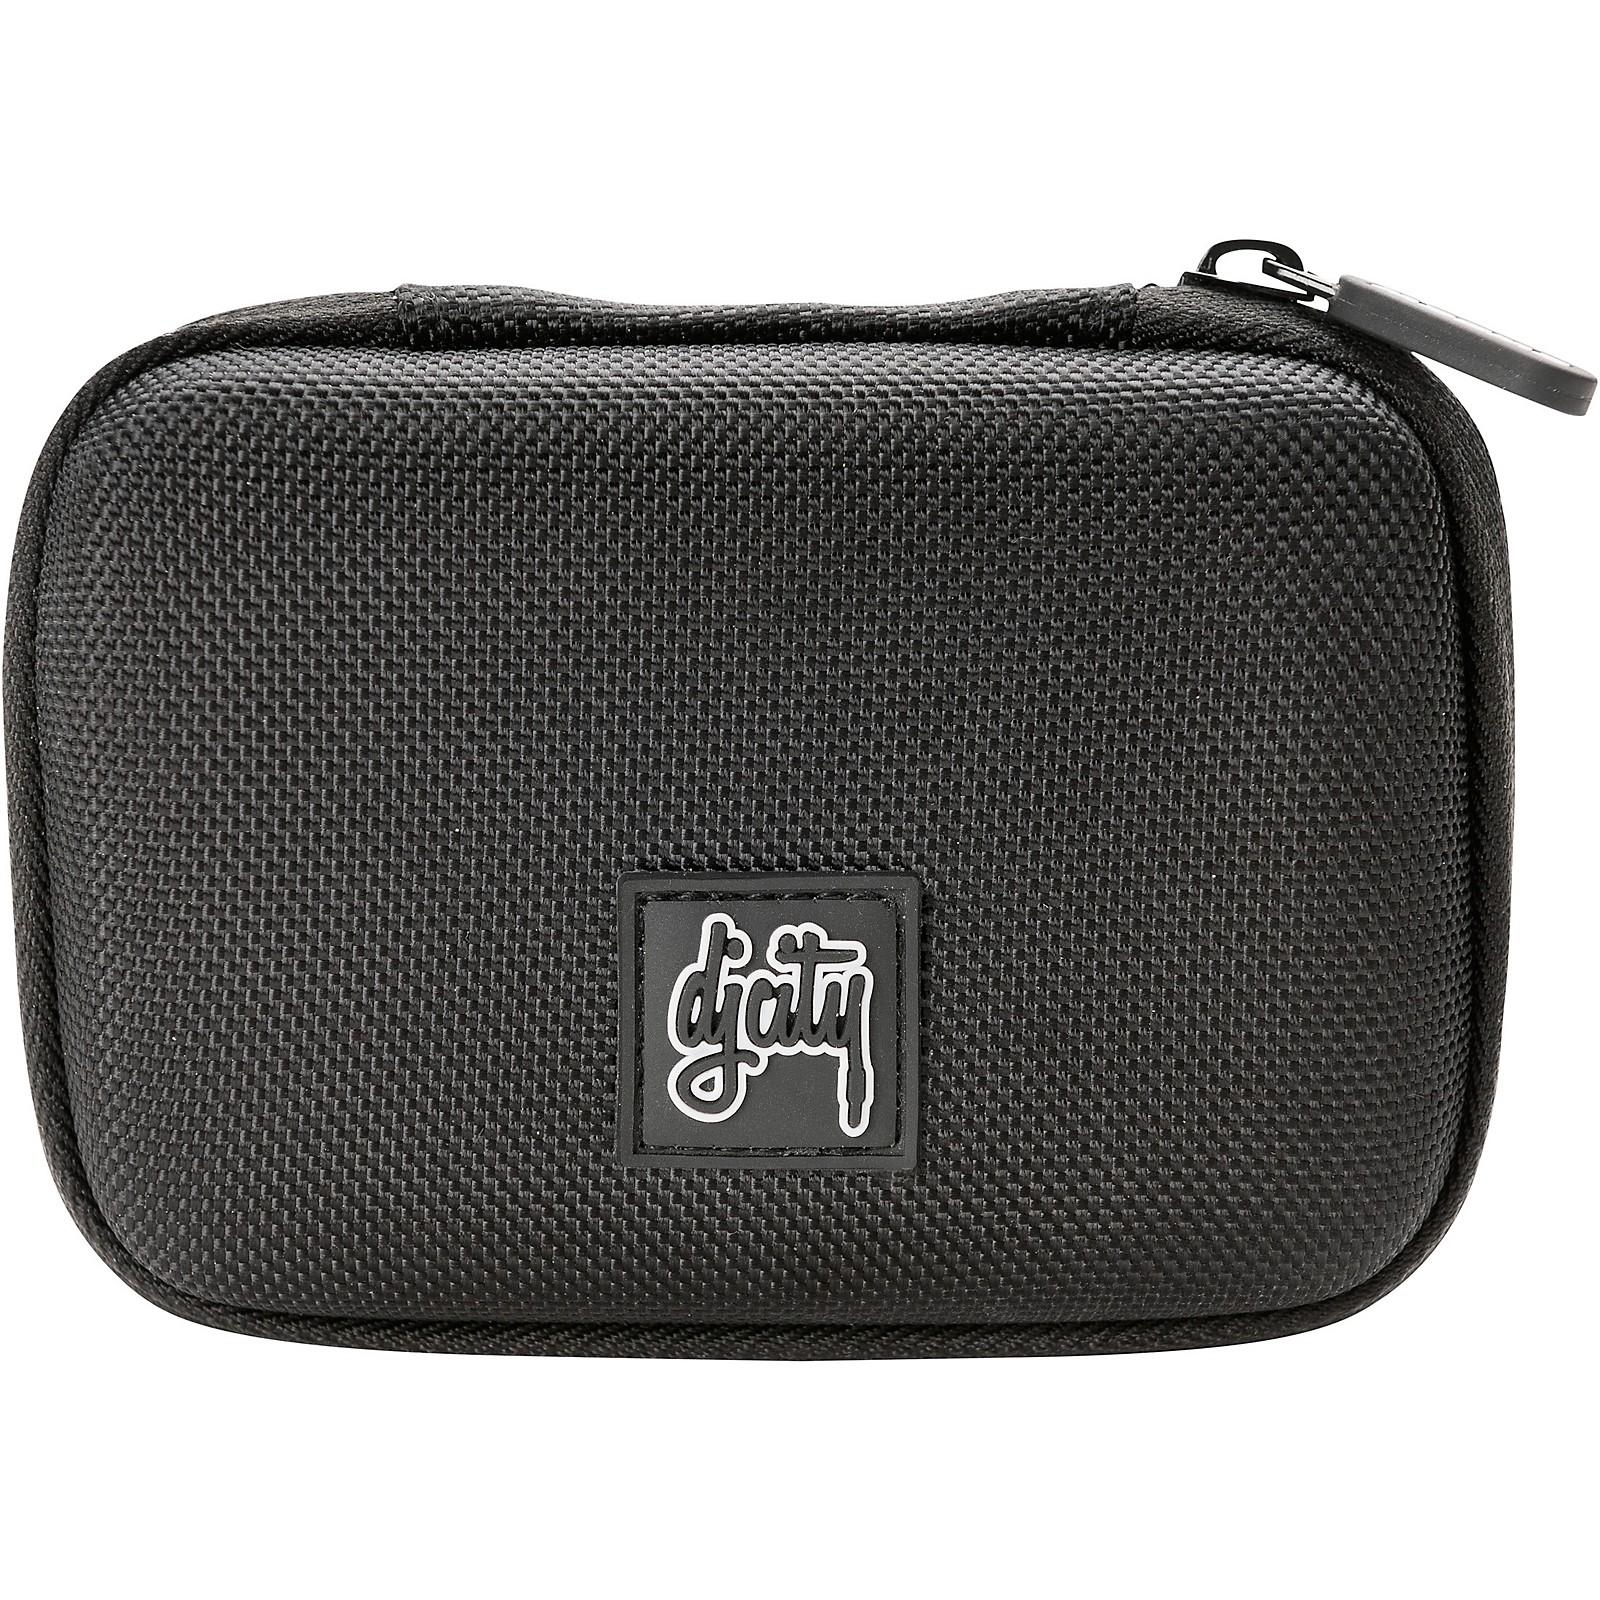 Magma Cases DJcity Edition USB Case